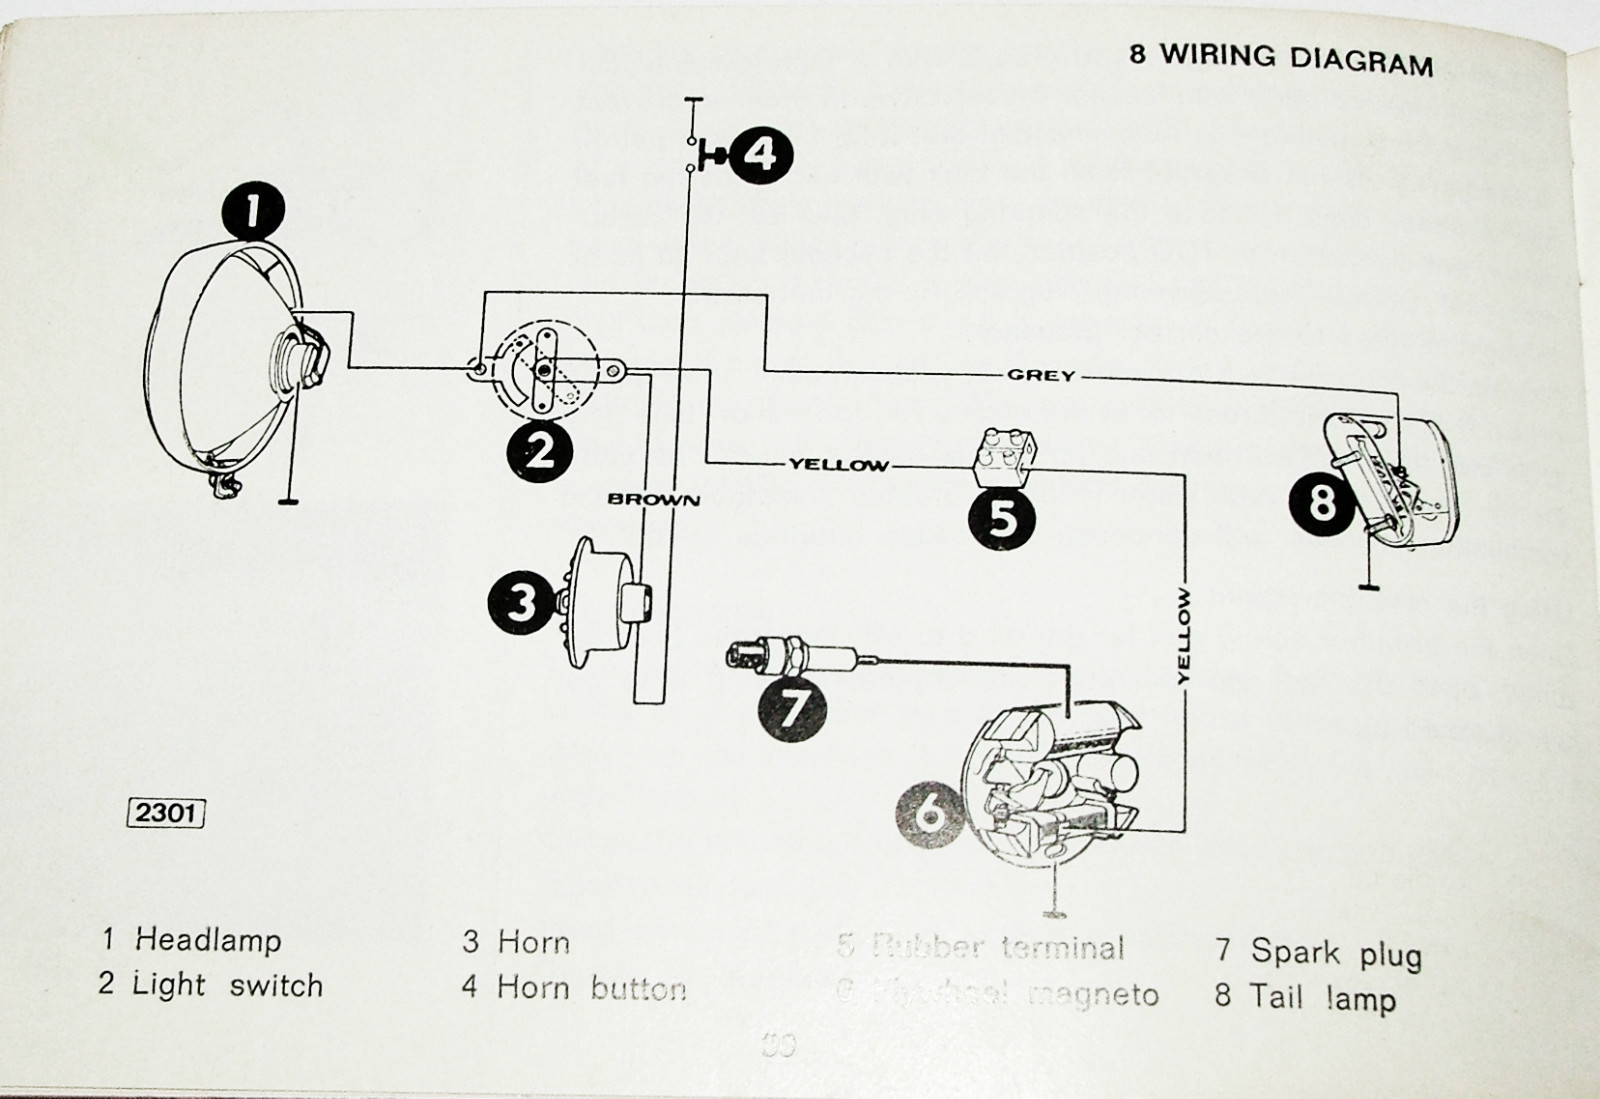 re no spark garelli ssxl Cf Moto Wiring Diagram Saxon Wiring Diagram